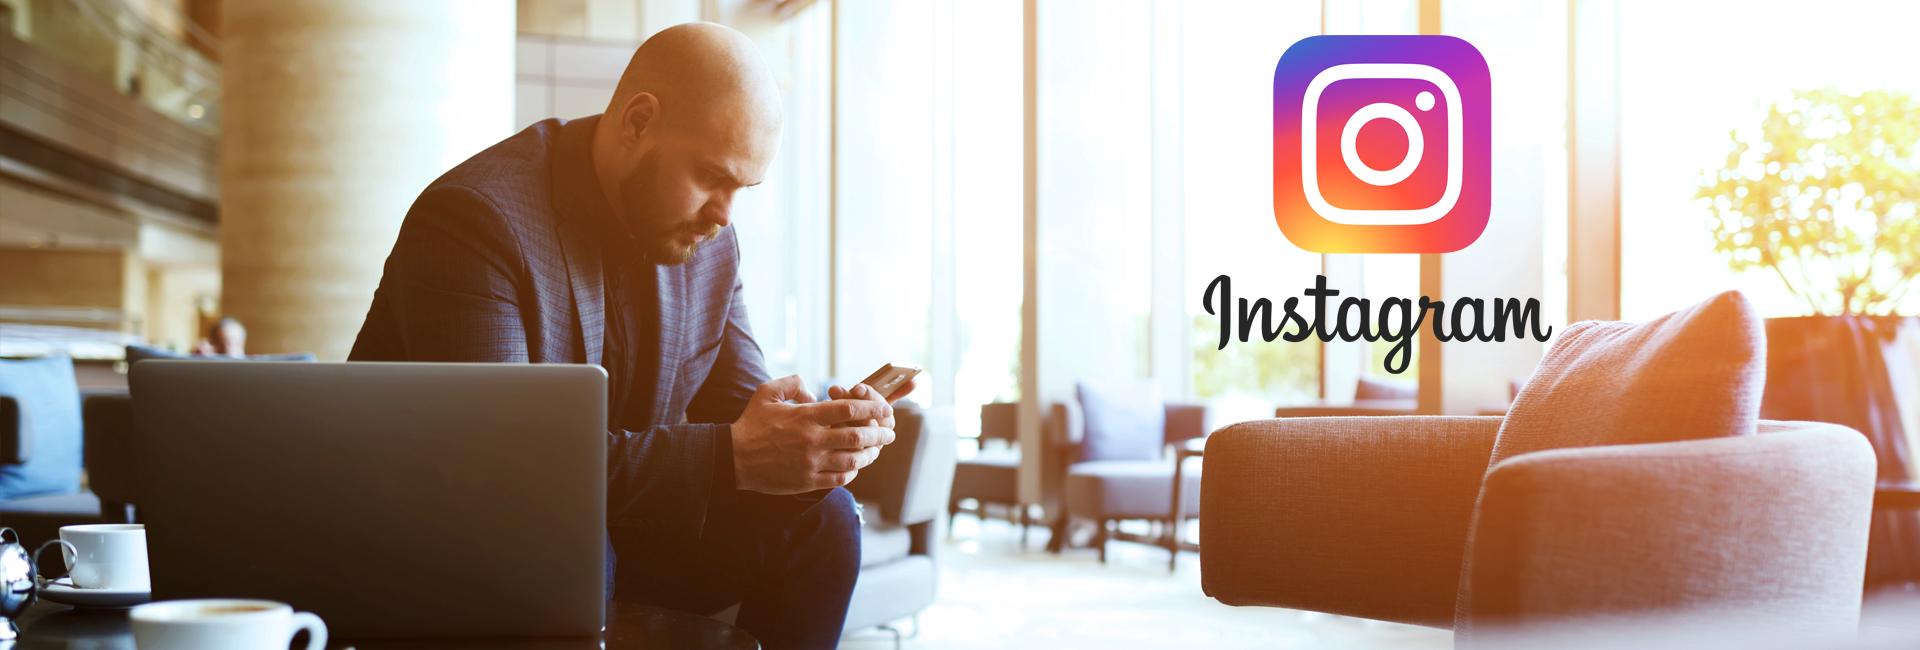 Instagram webcasting company